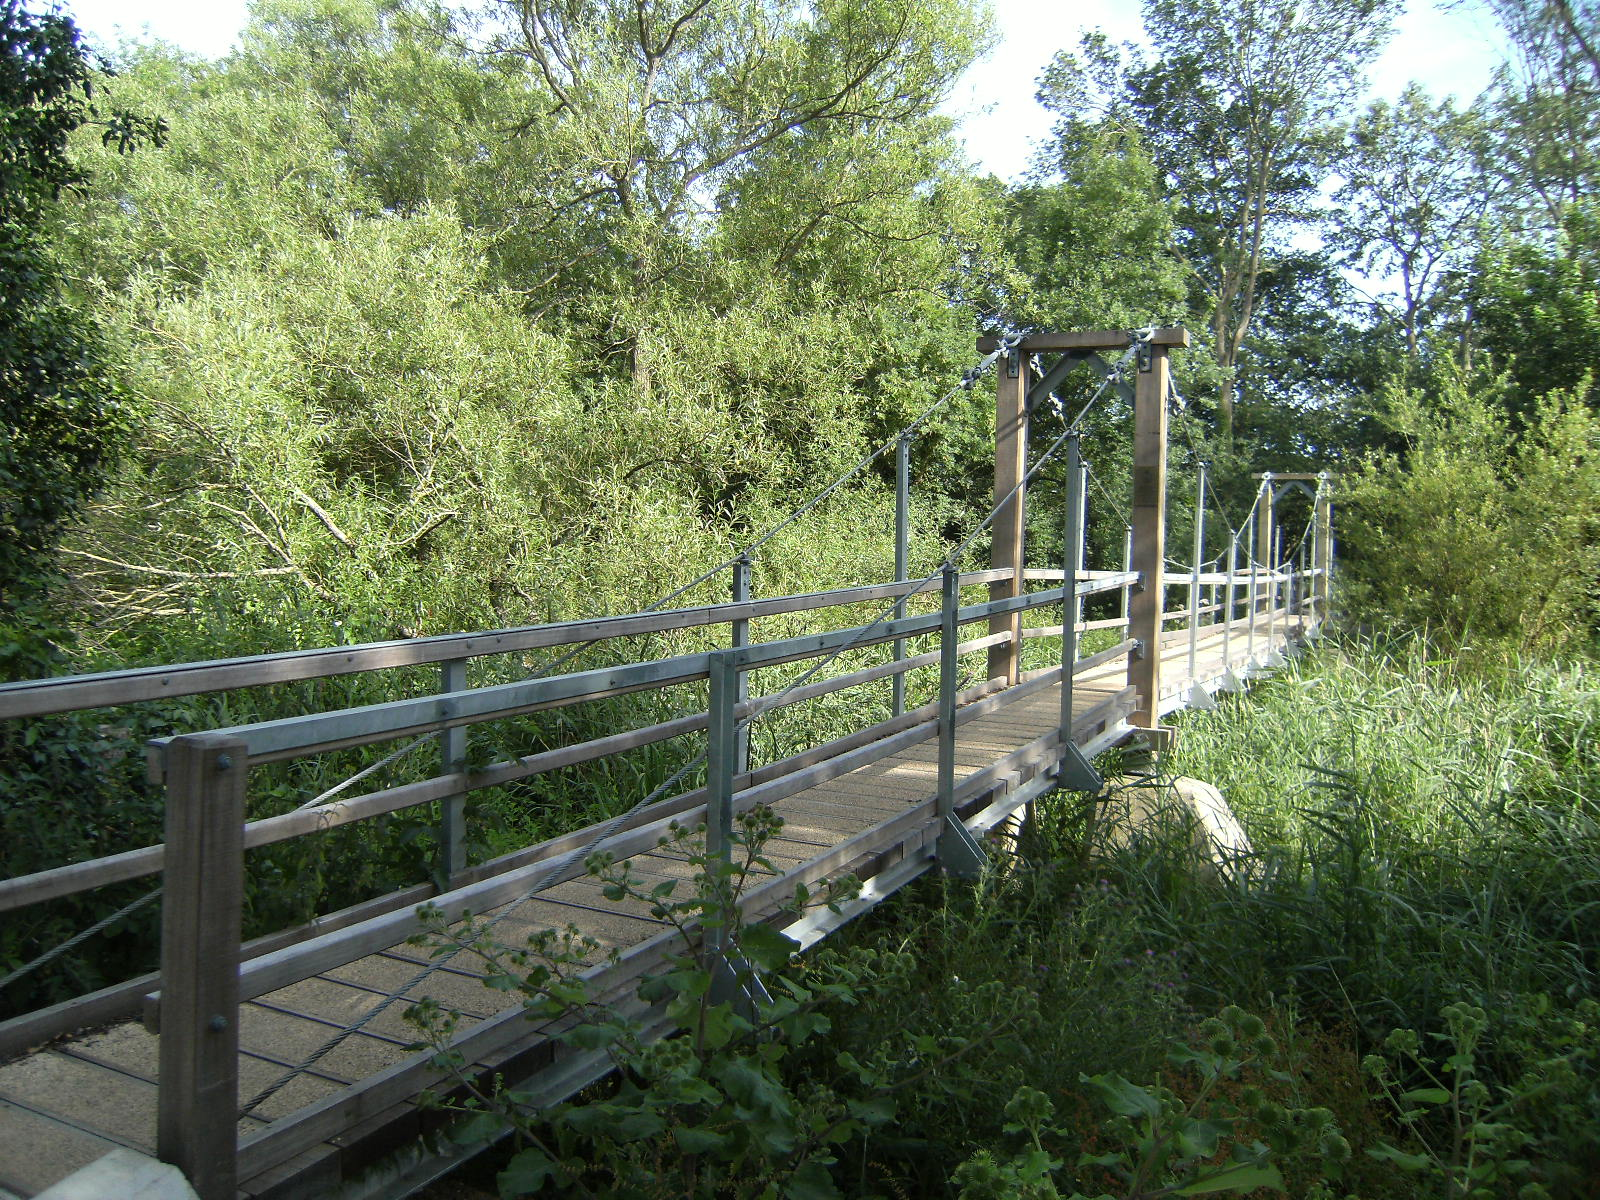 1007190178 New footbridge near North Stoke